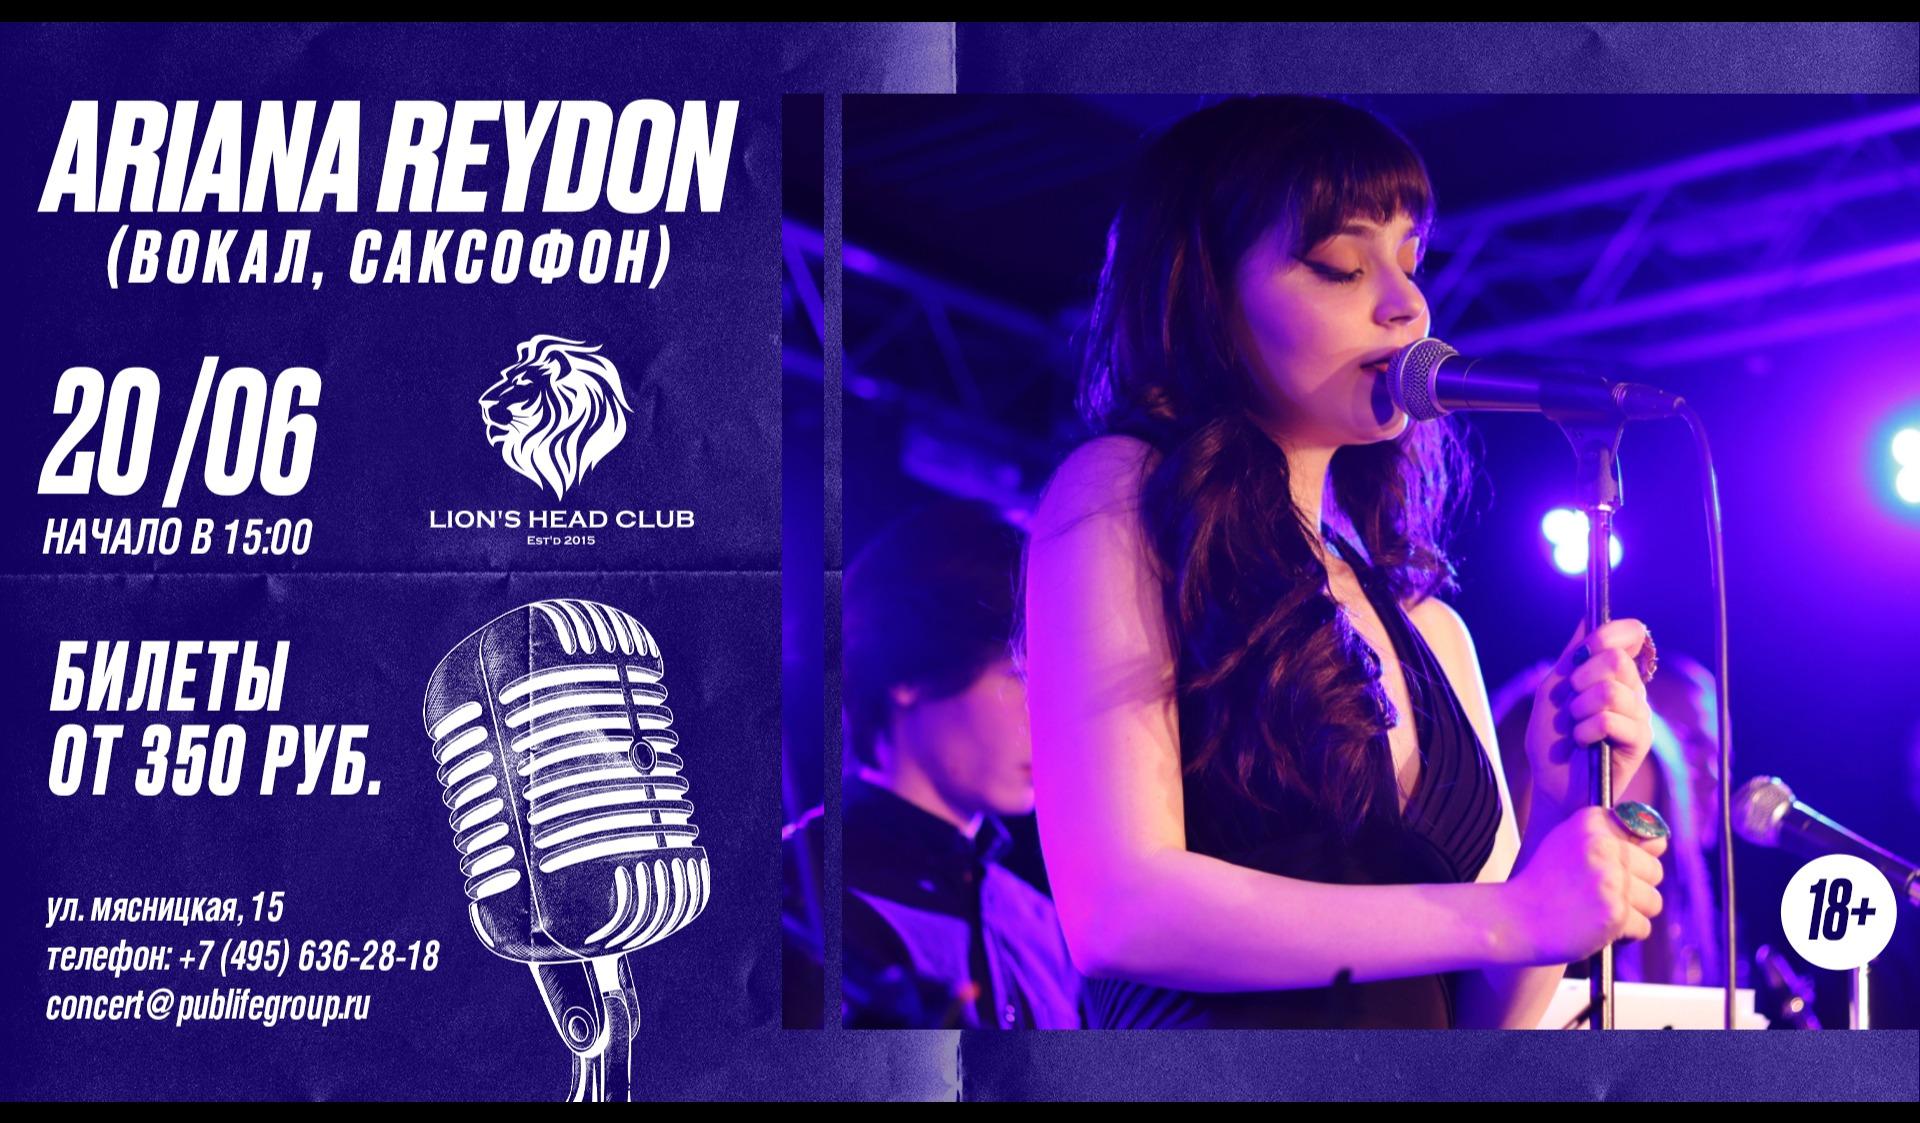 Ariana Reydon